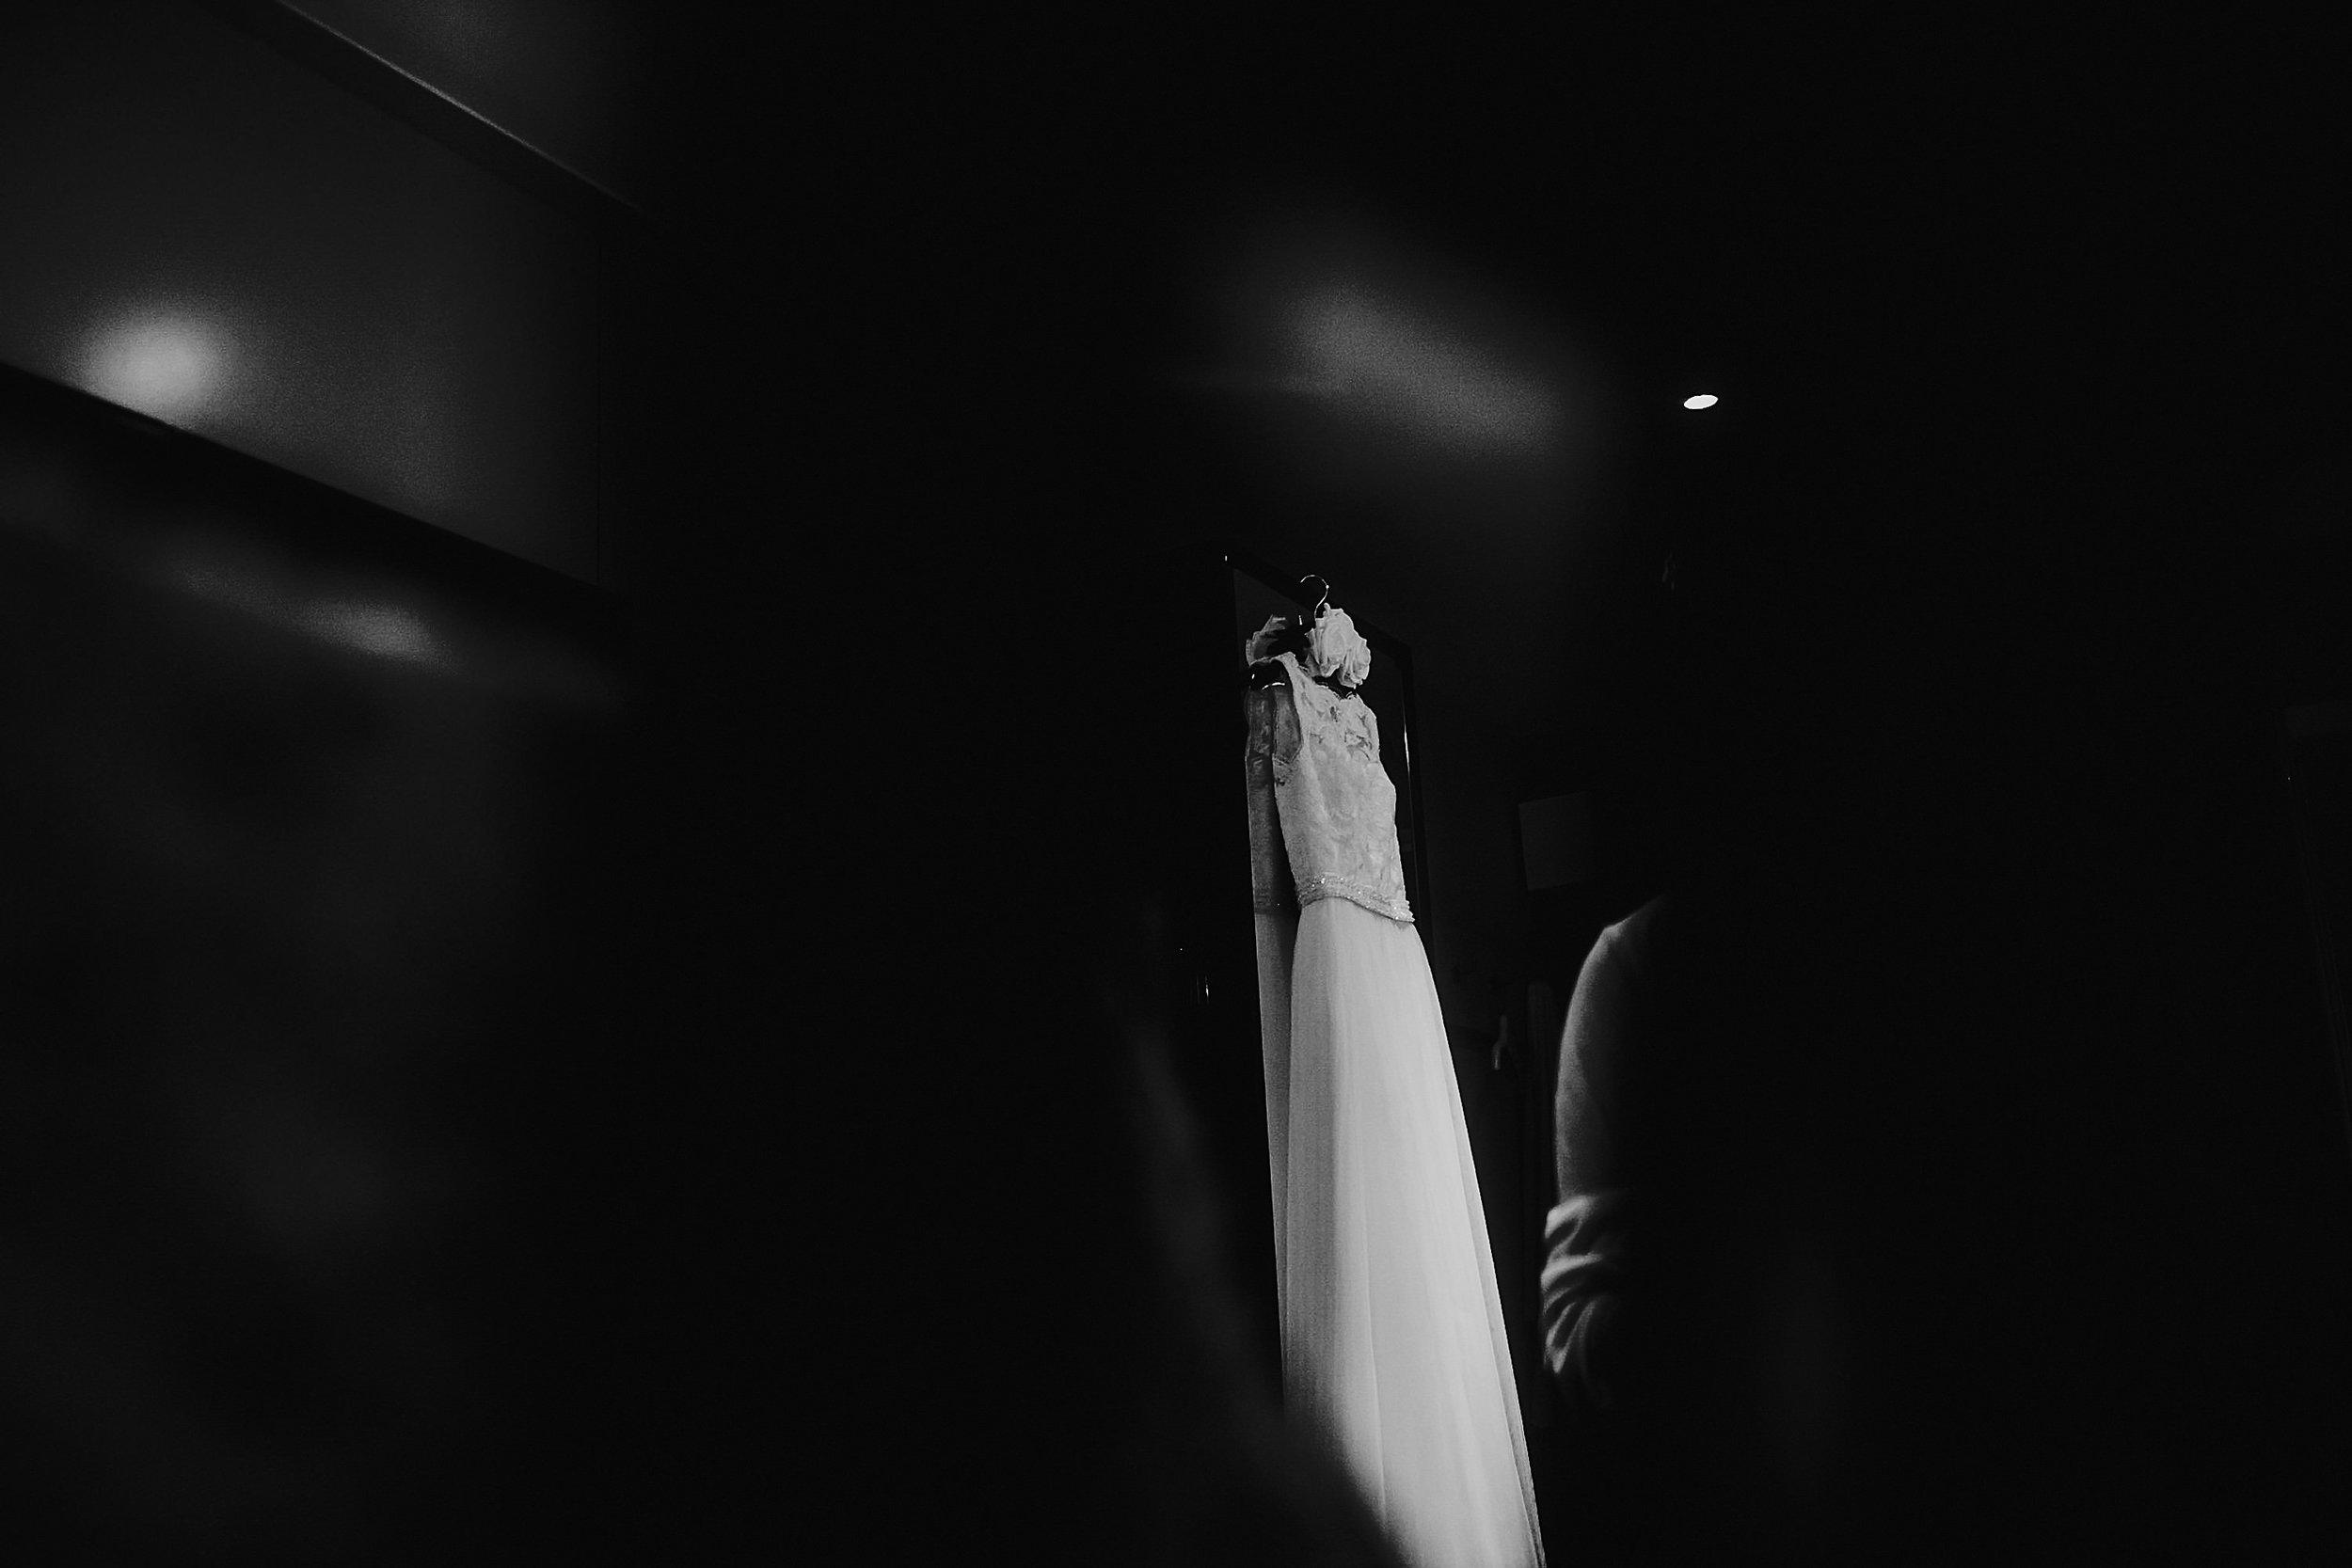 Jonathan Flint photography